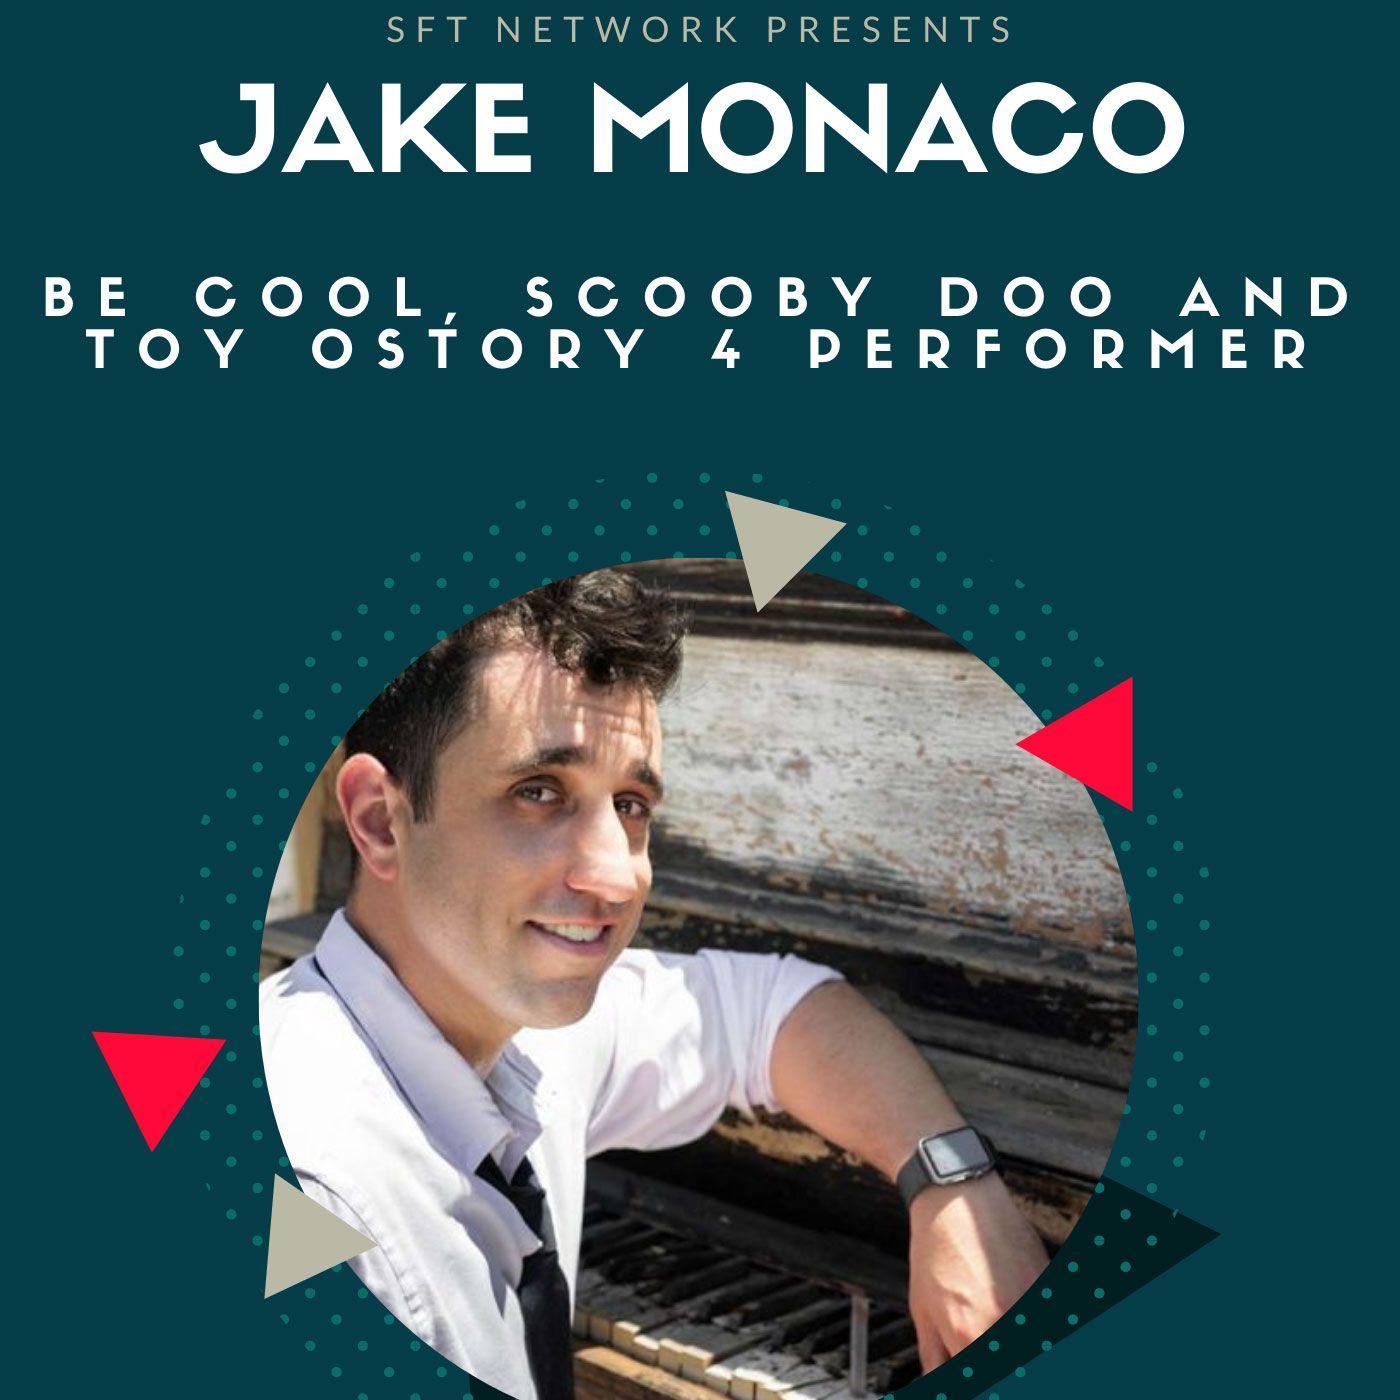 Jake Monaco